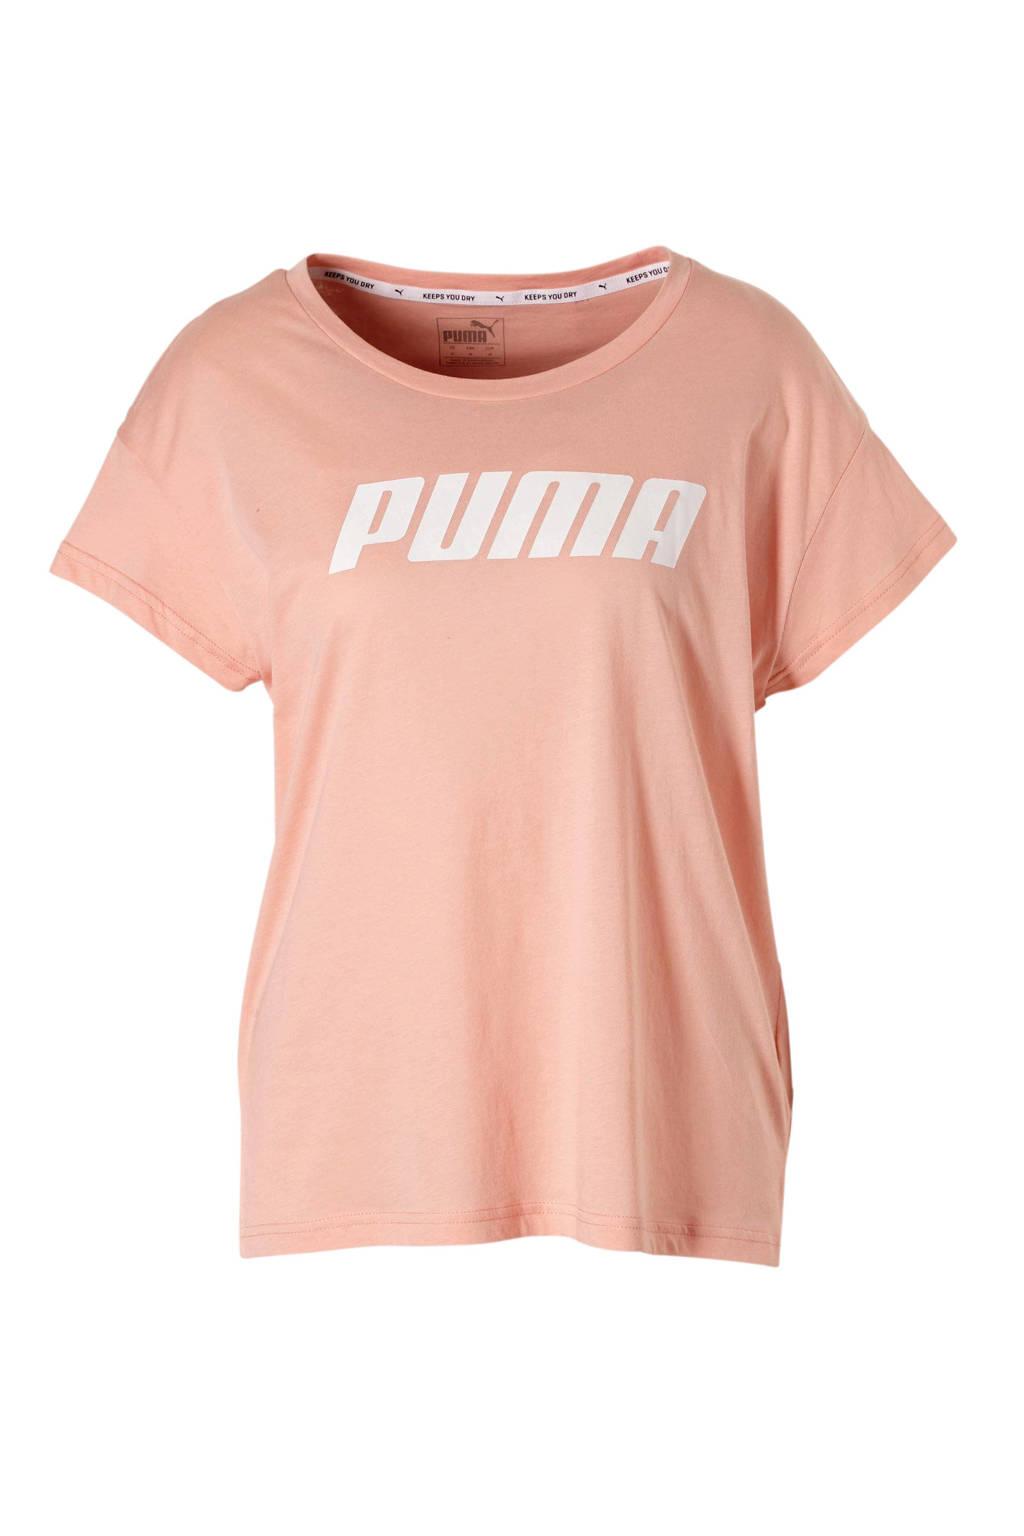 Puma sport T-shirt roze, Roze/wit